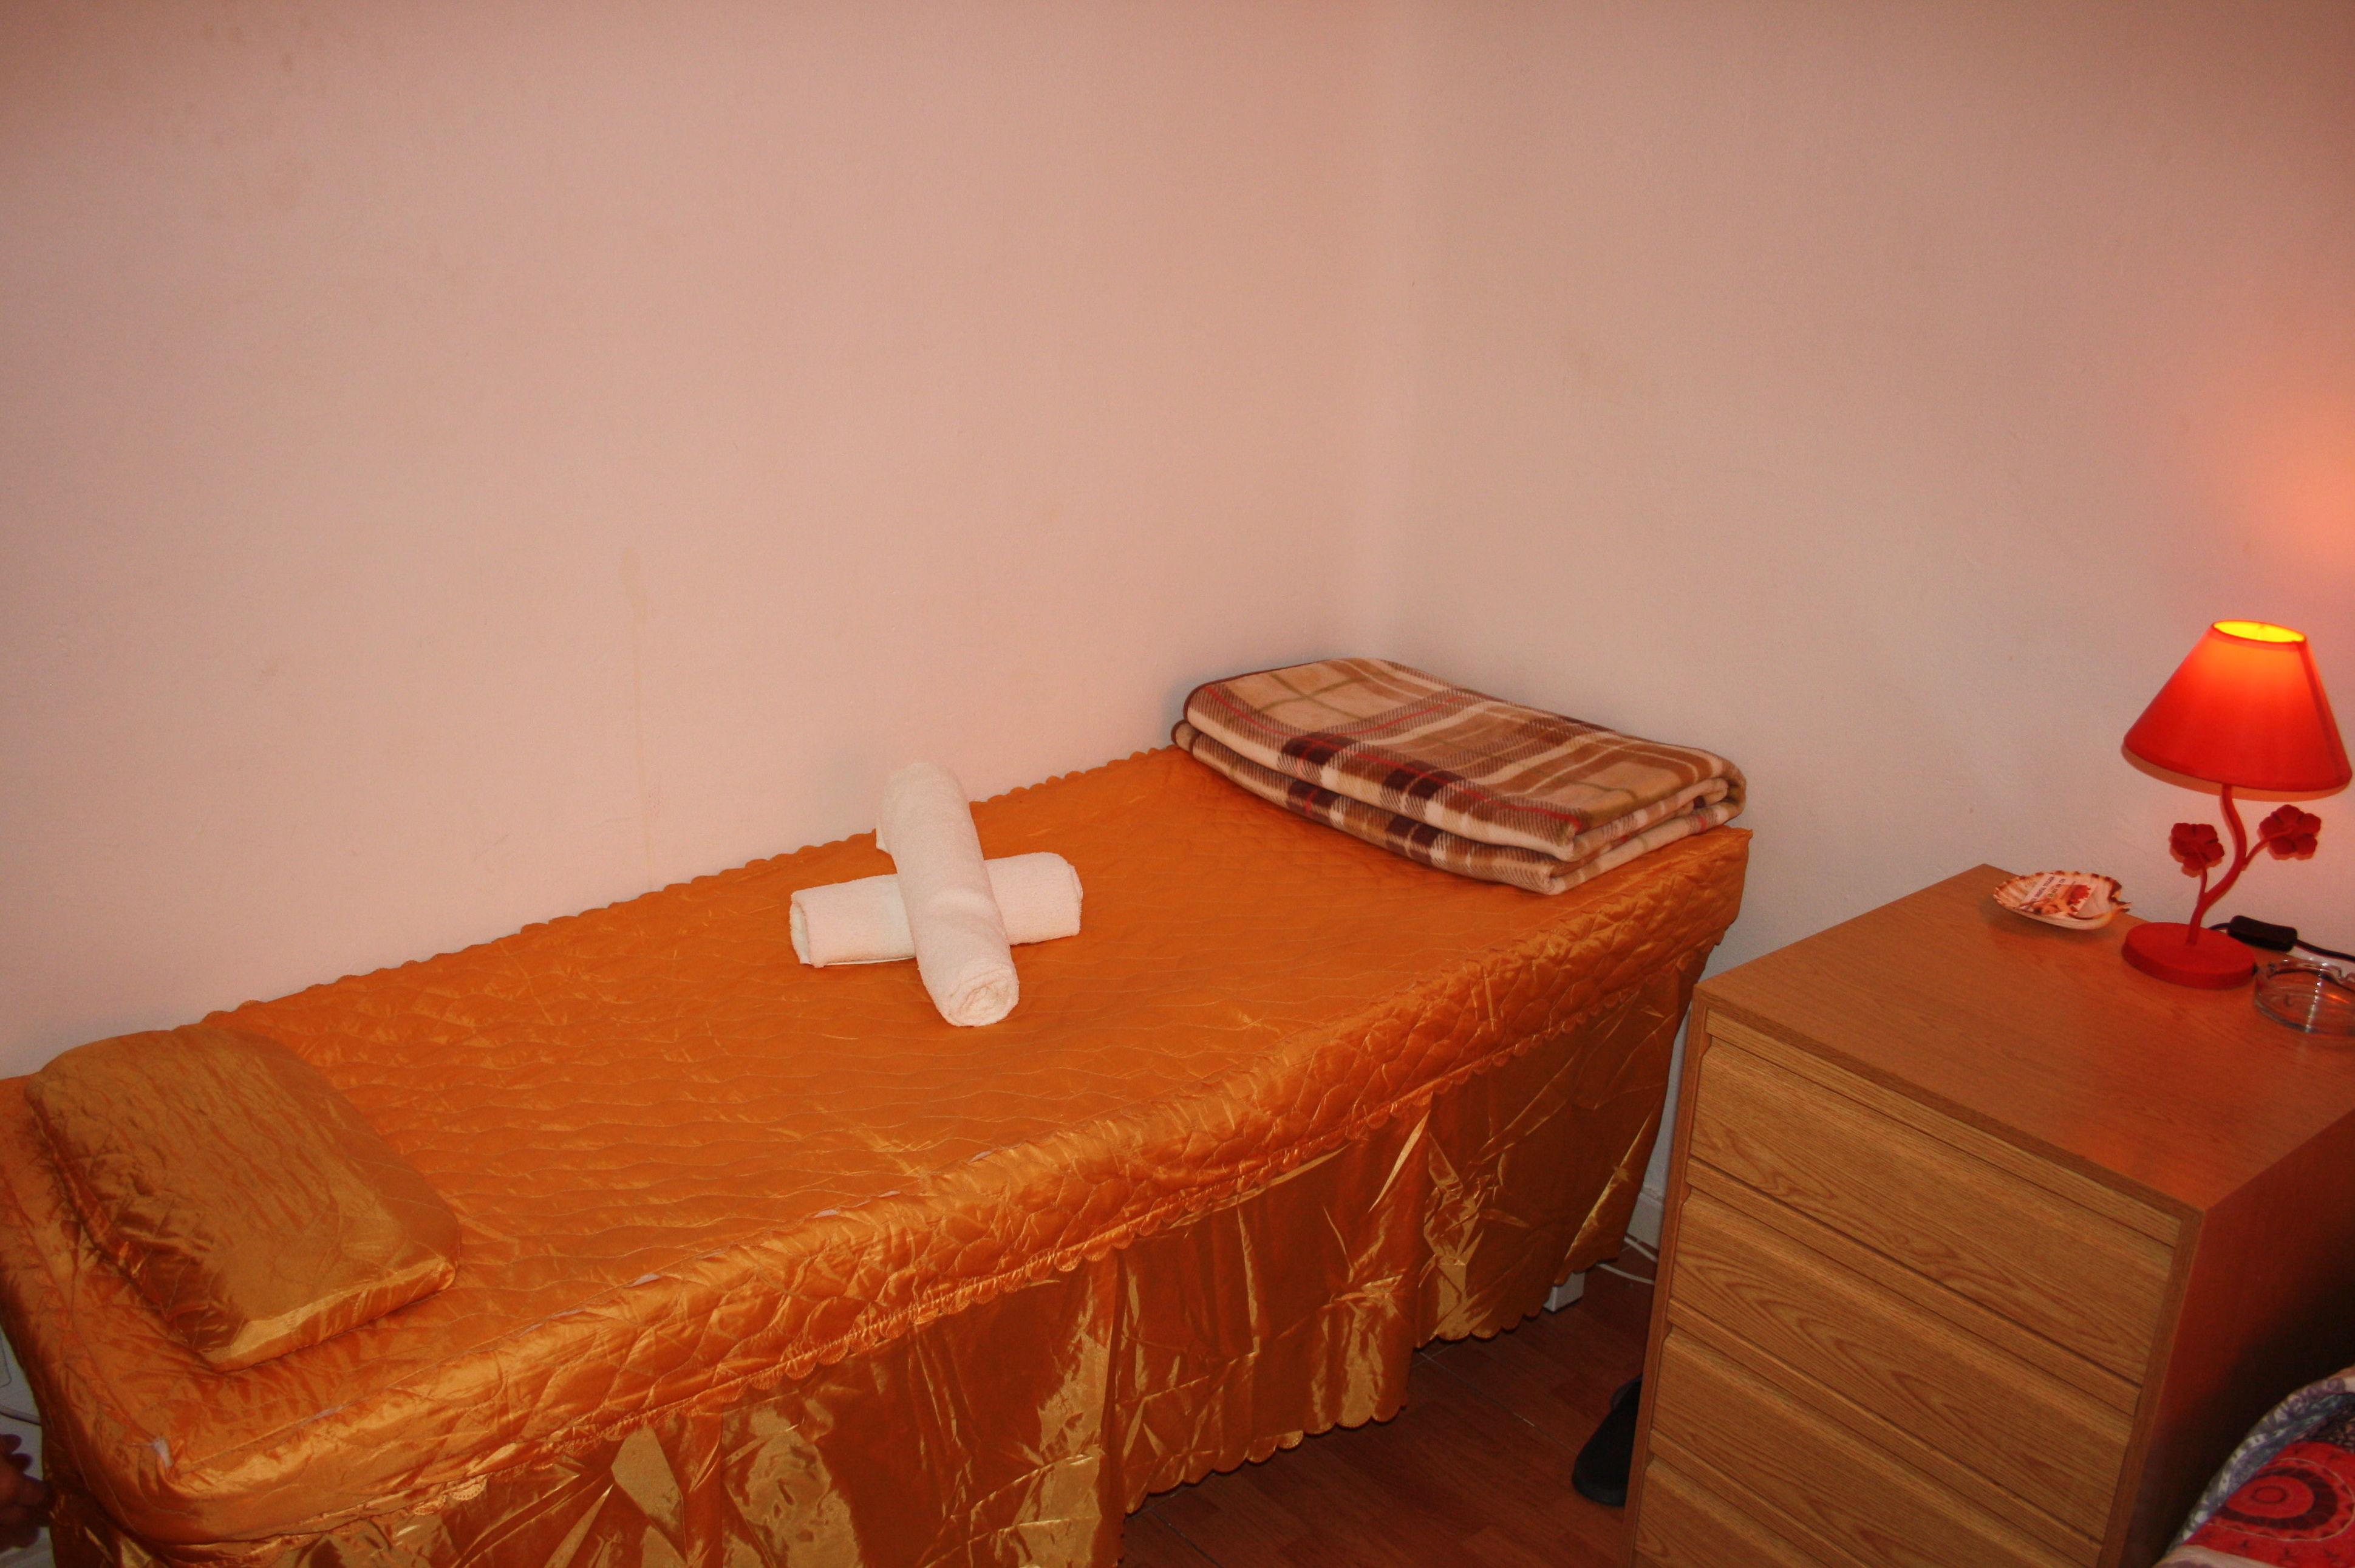 Foto 10 de Erotic massage en Madrid | Oriental Massage Madrid